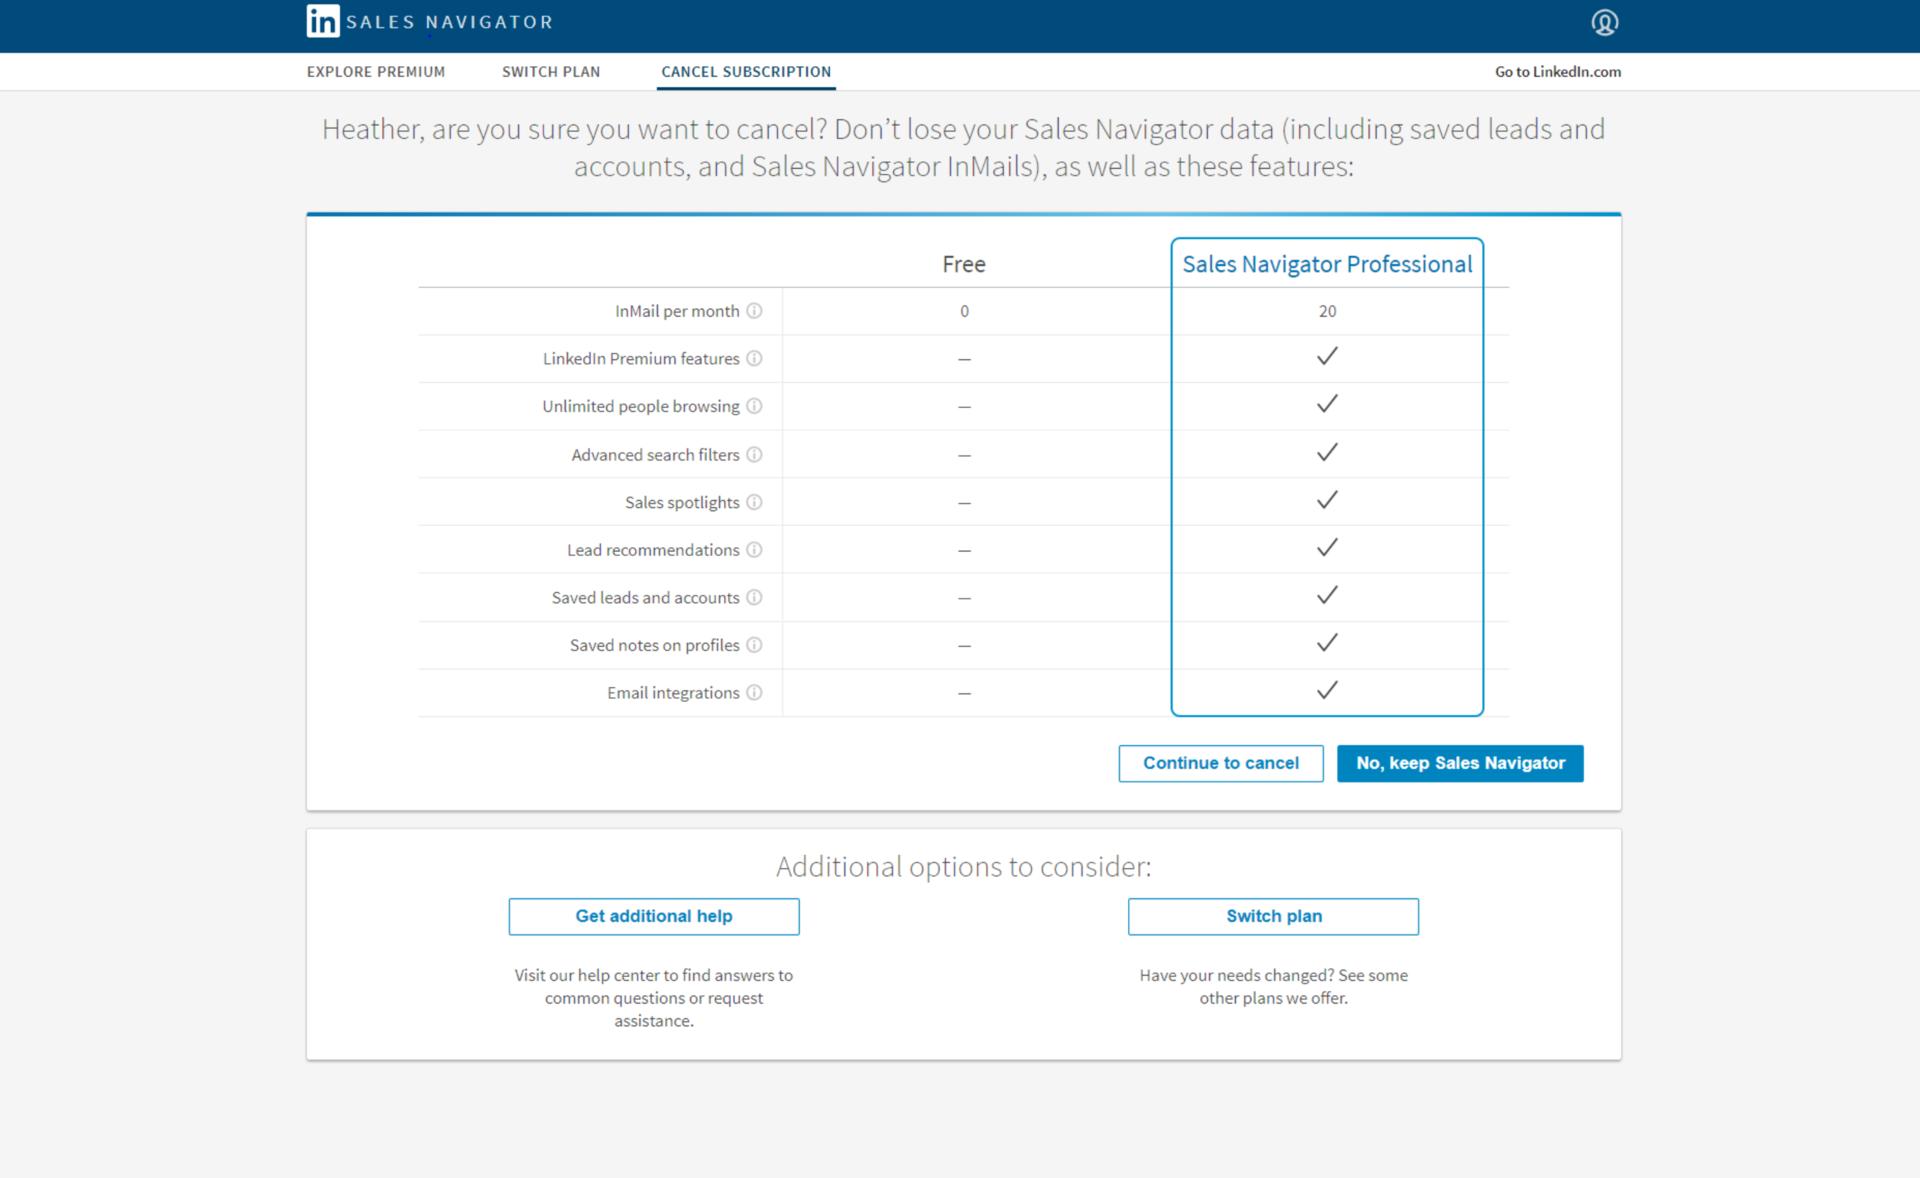 How to Cancel Your LinkedIn Premium Sales Navigator Account